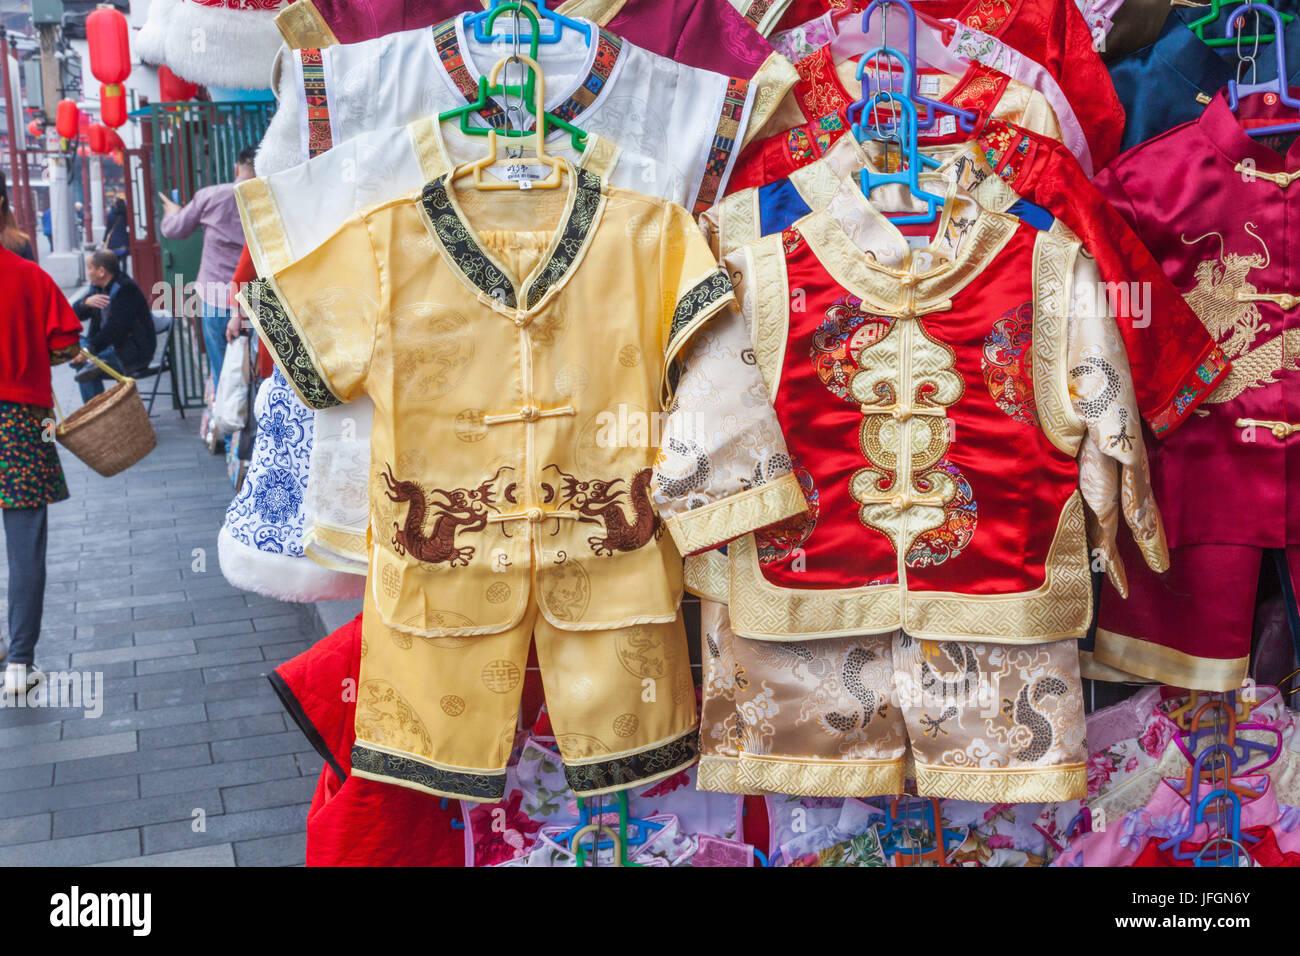 China, Shanghai, Yuyuan Garden, Shop Display of Traditional Childrens' Clothing - Stock Image